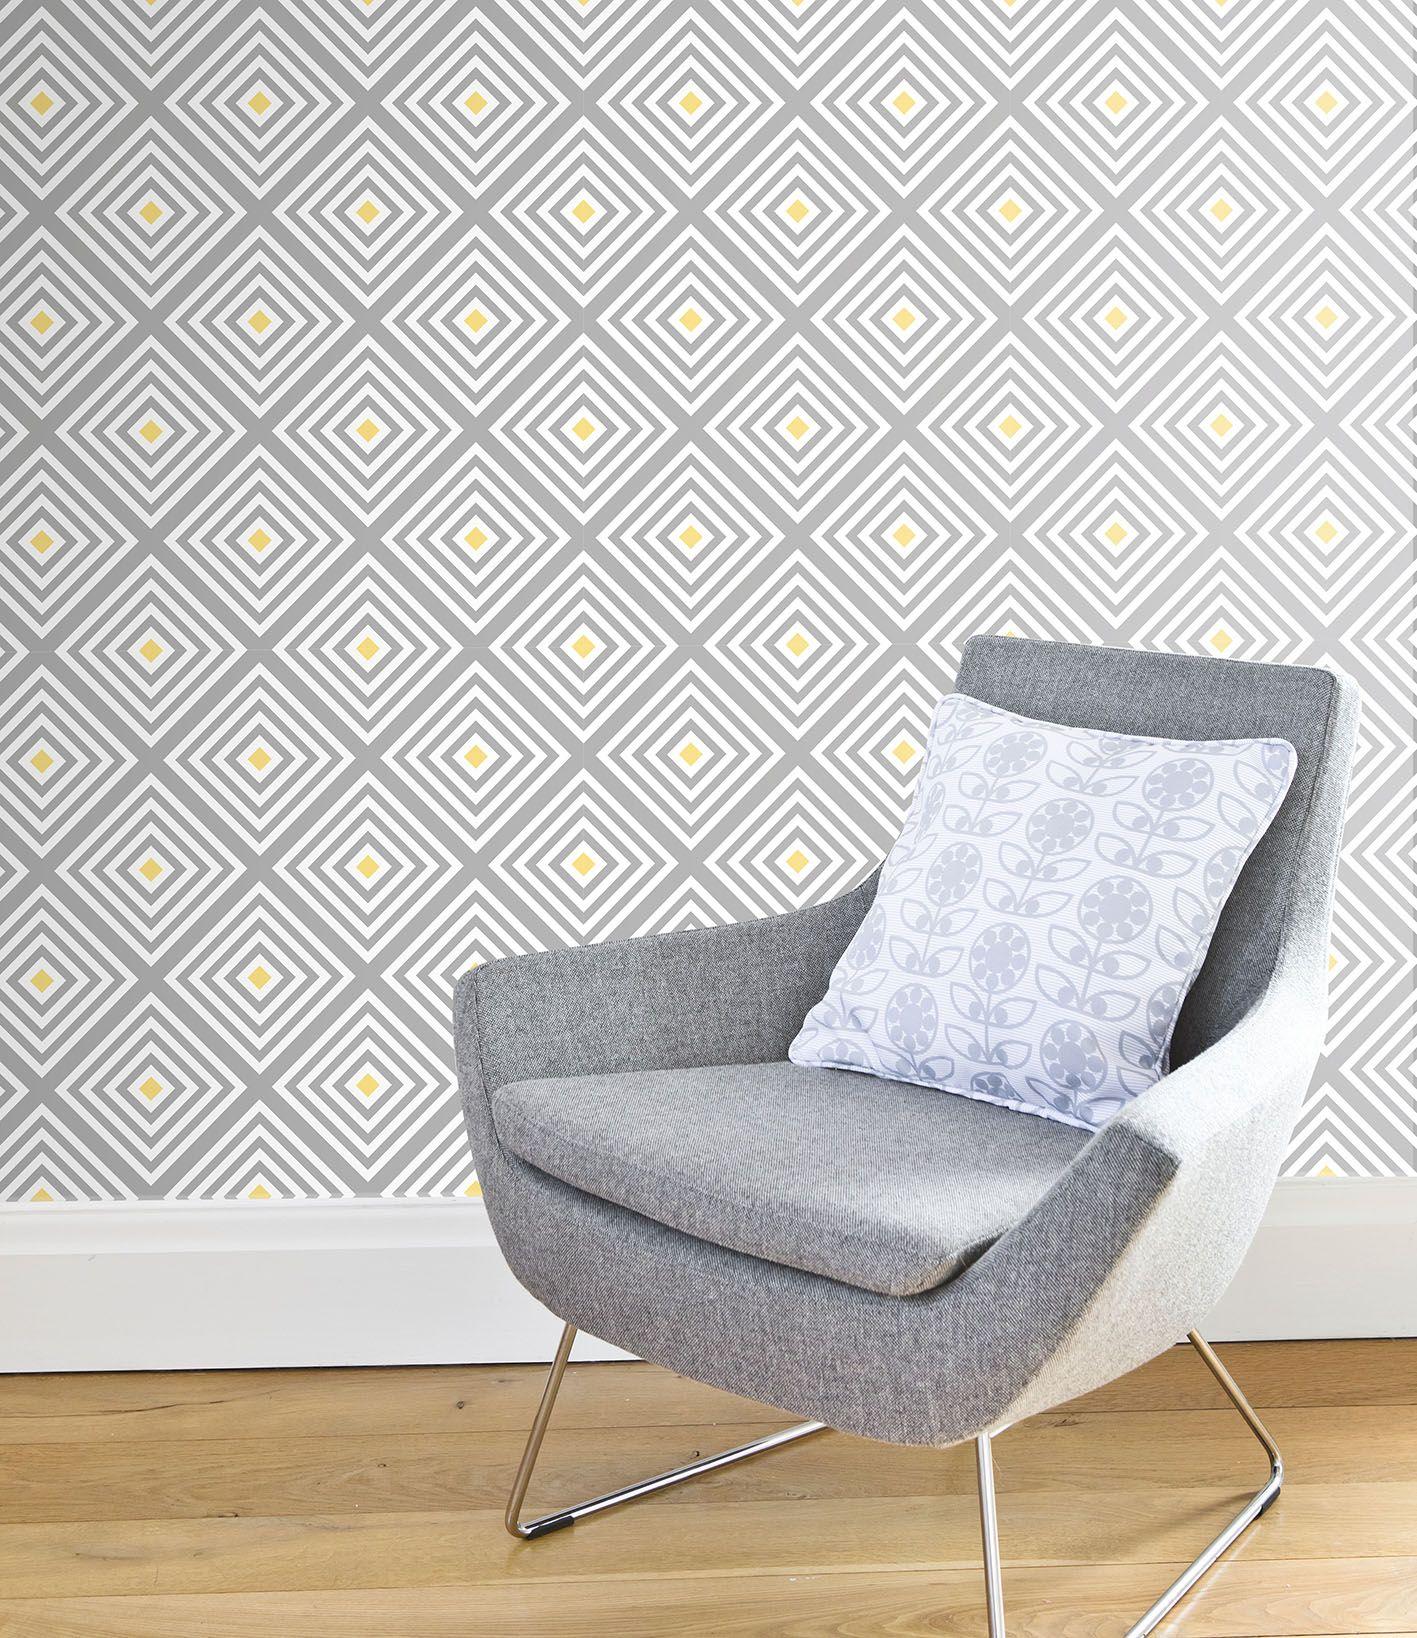 Diamond wallpaper from Layla Faye Retro modern